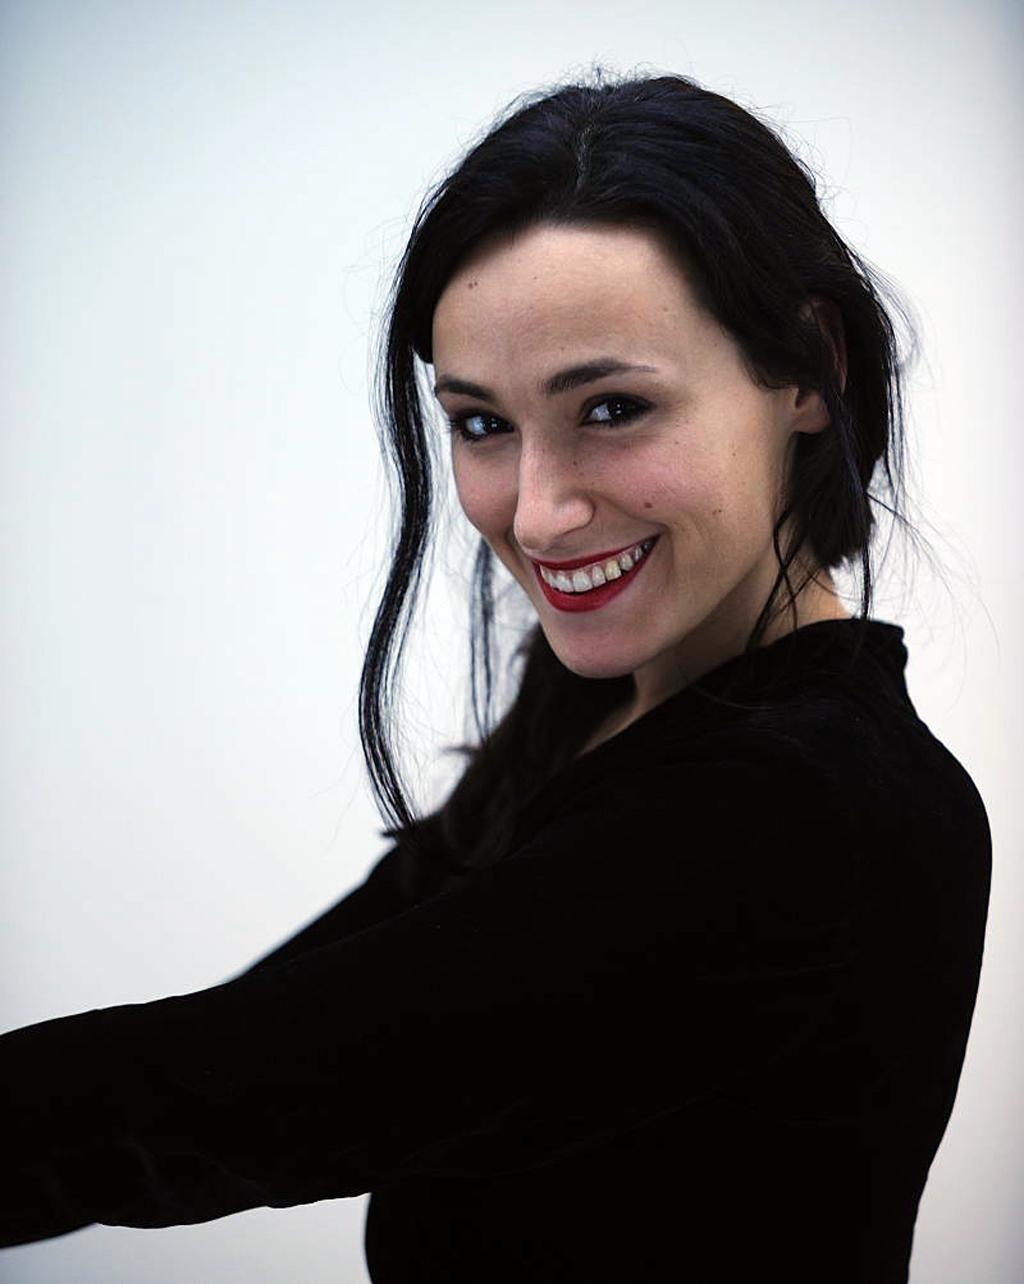 arijana-robert-schultze-2011-05